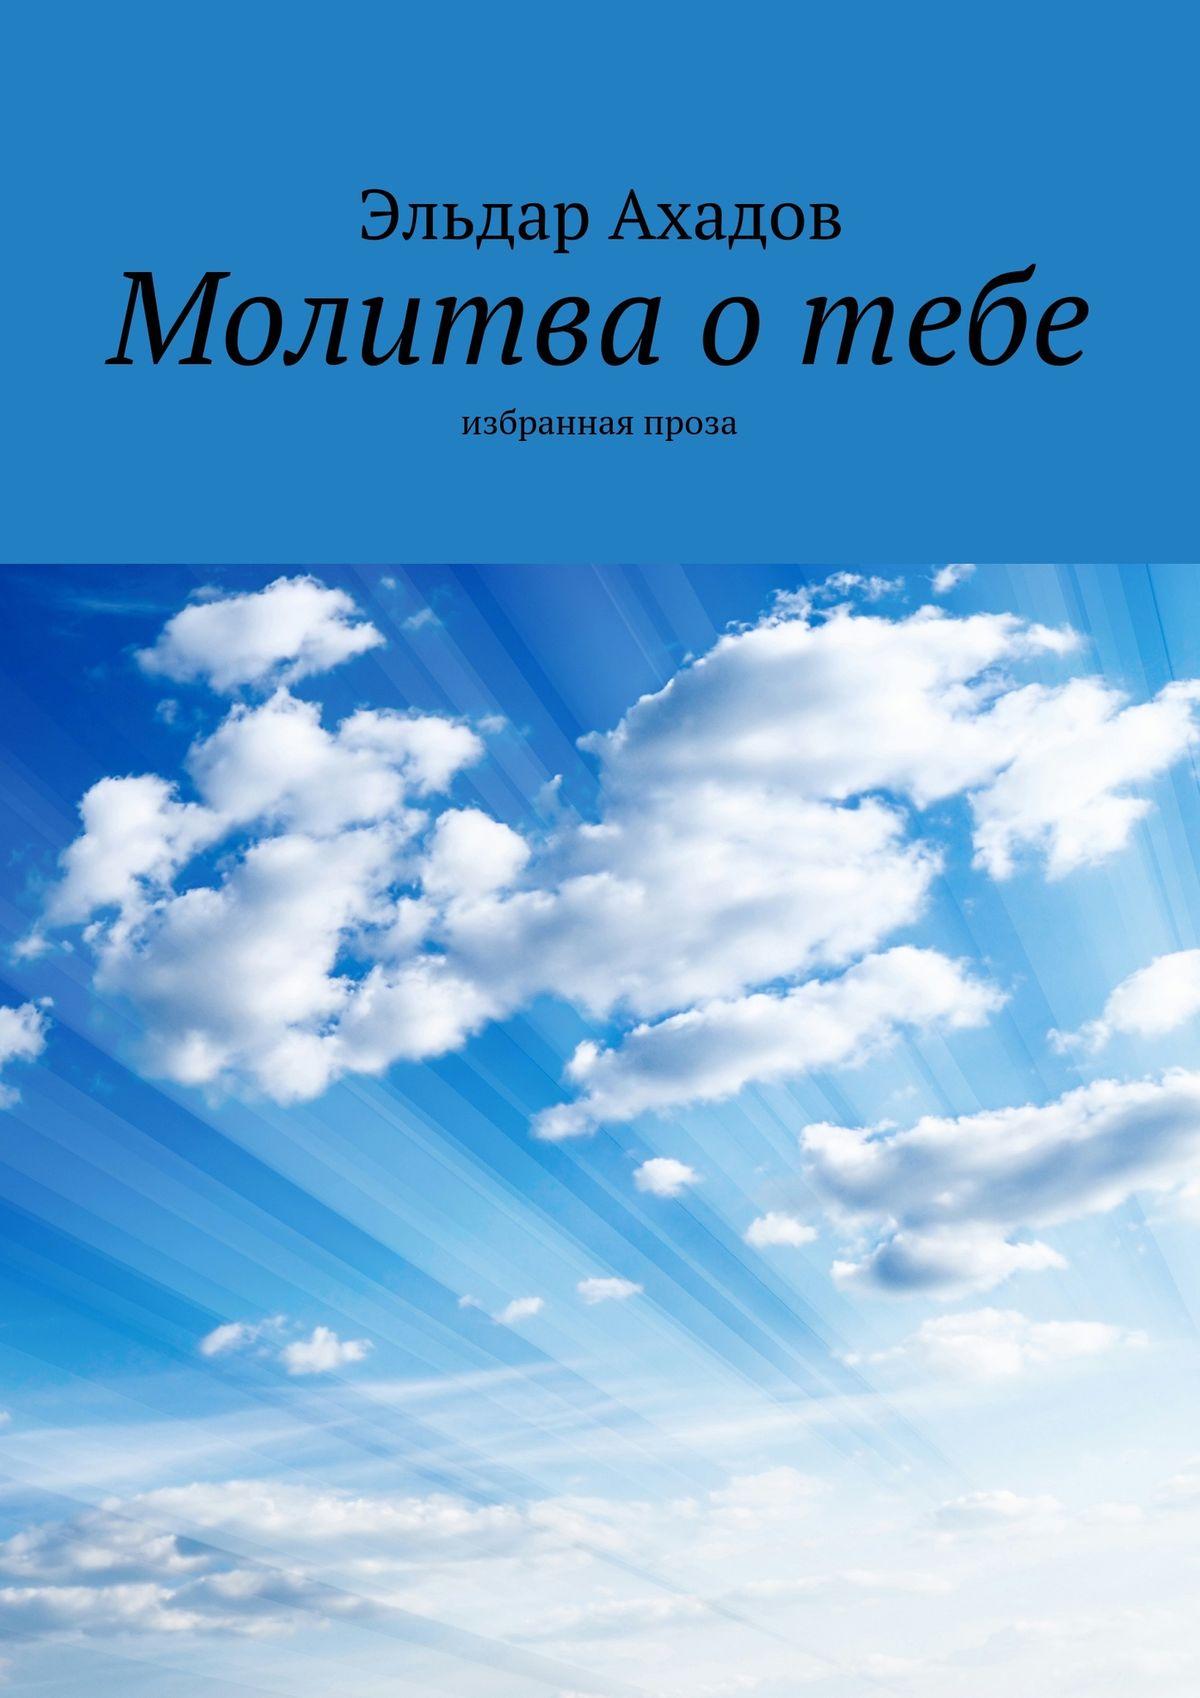 Эльдар Ахадов Молитва отебе. Избранная проза халлесби о молитва